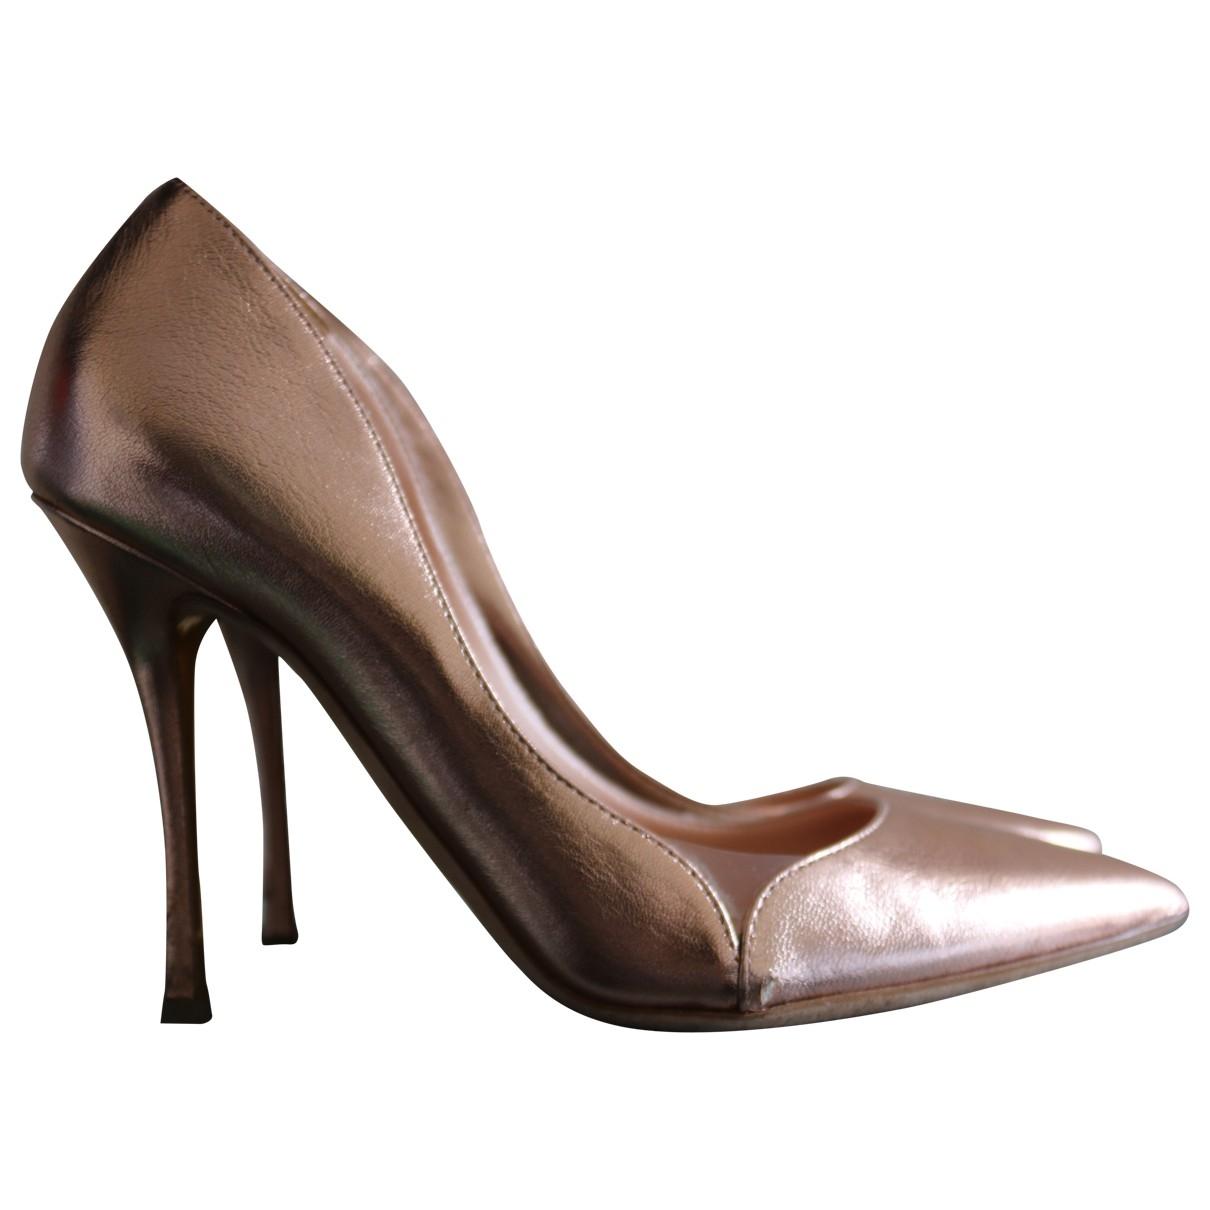 Rupert Sanderson \N Metallic Leather Heels for Women 37.5 EU